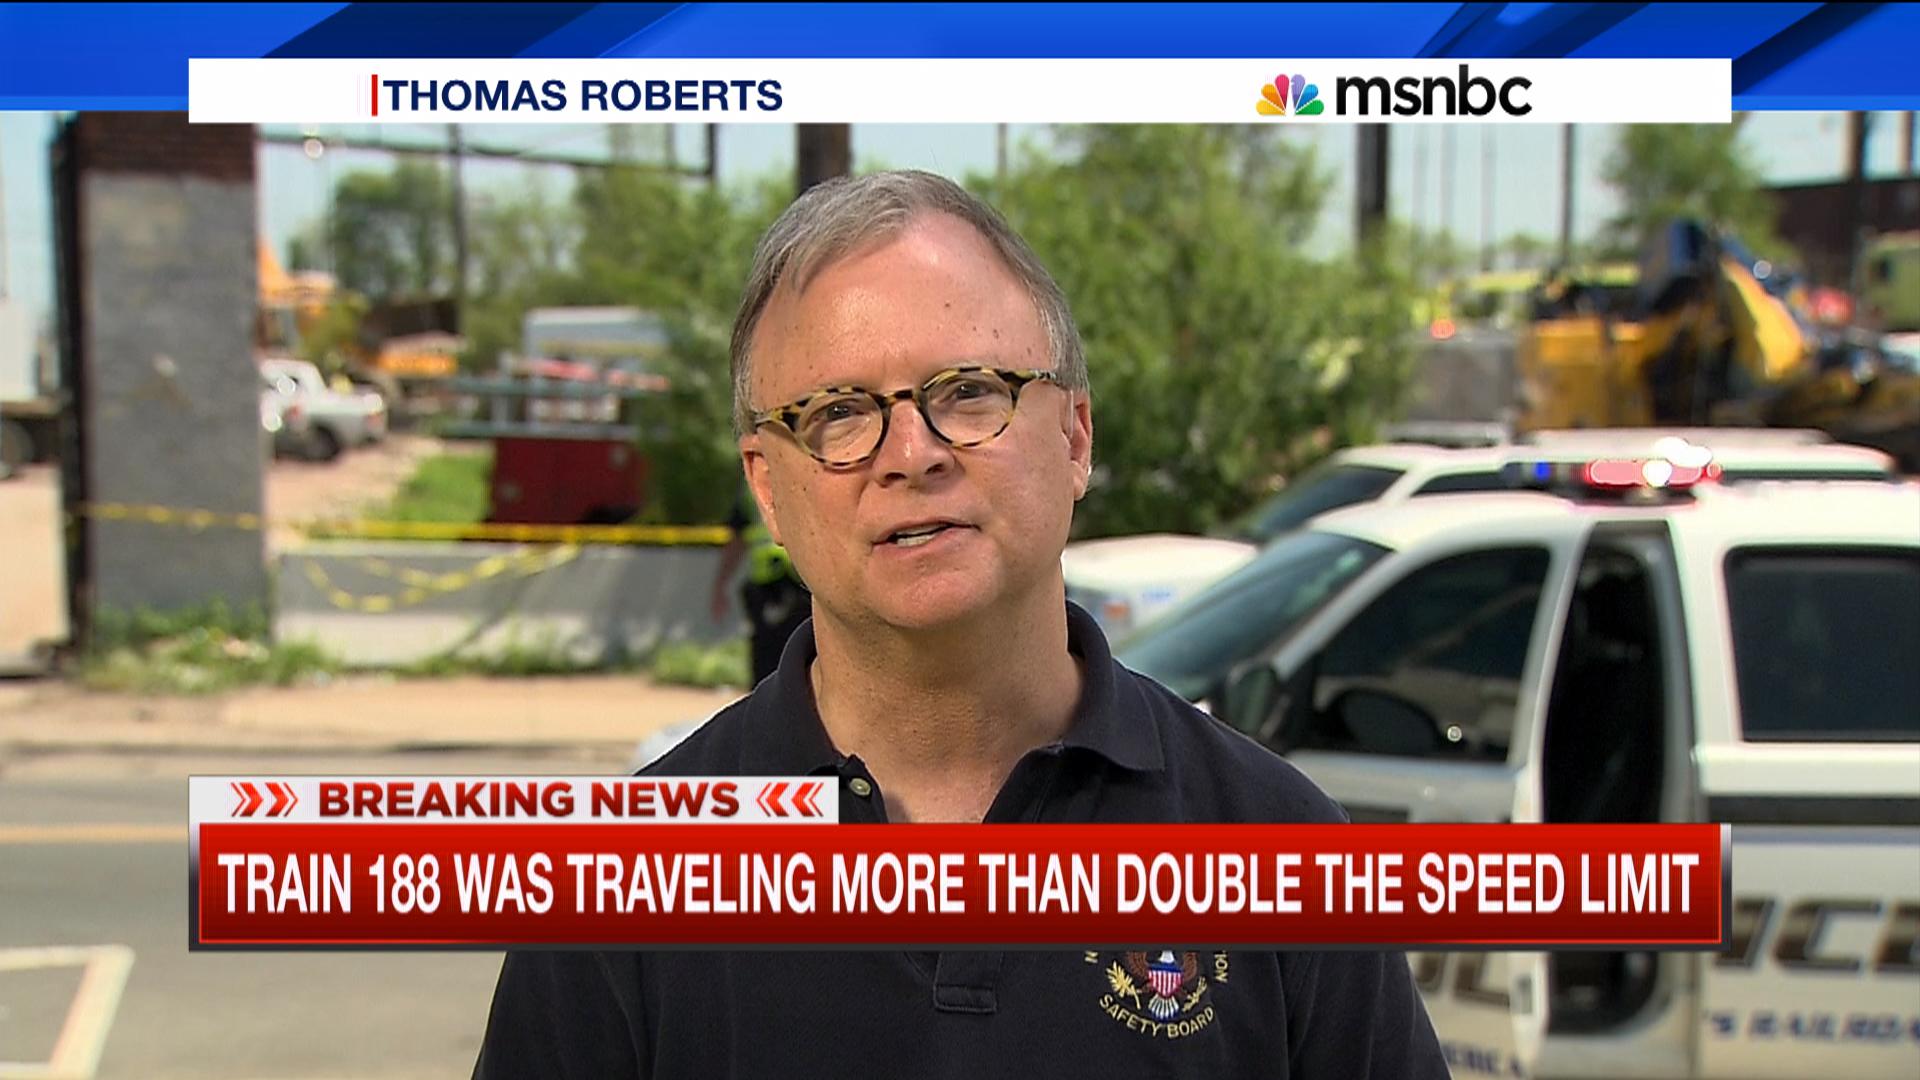 NTSB investigates Amtrak crash